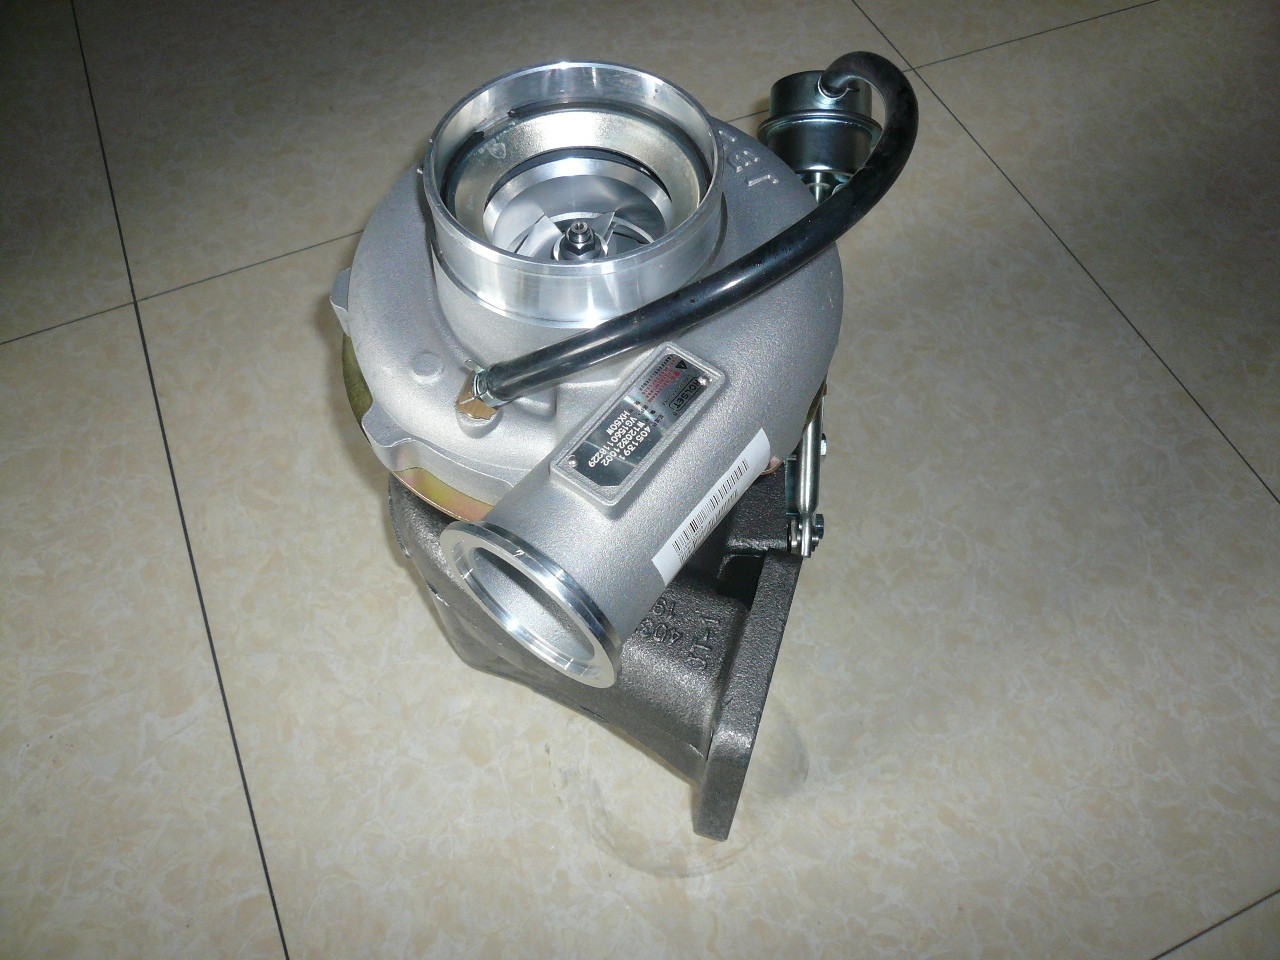 Турбина WP10 290 л.с. 612600118895 SHACMAN(турбокомпрессор)